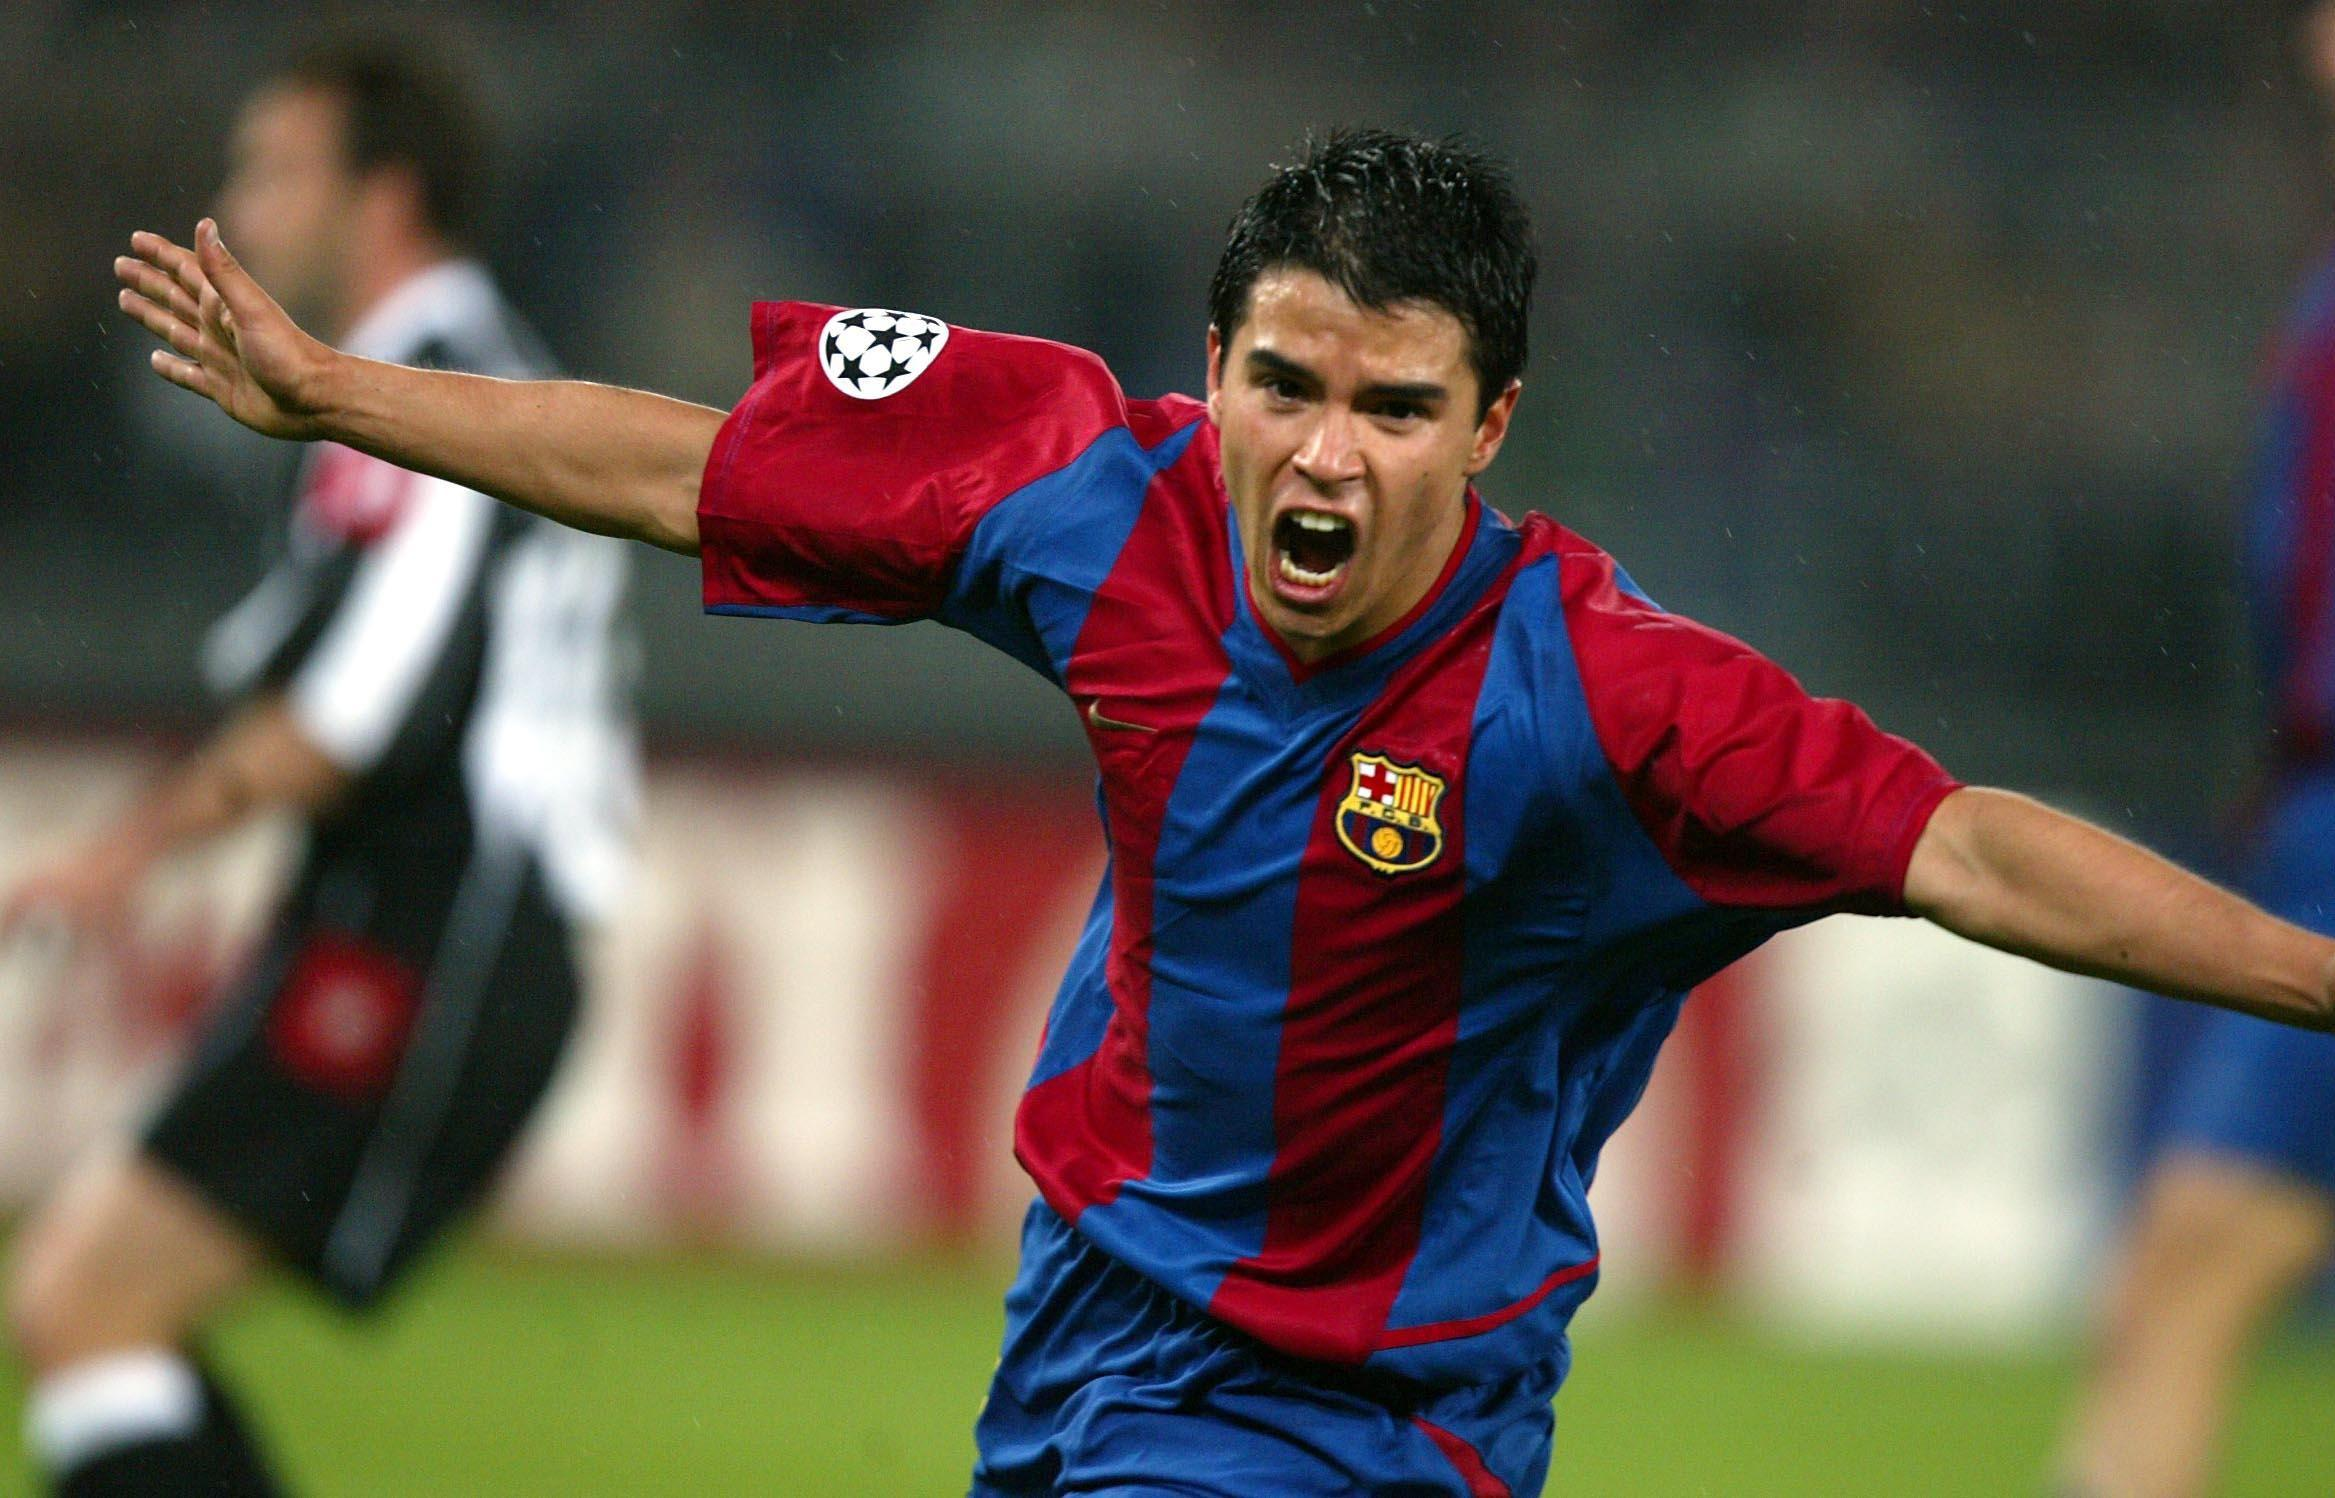 20 years since Saviola joined Barça